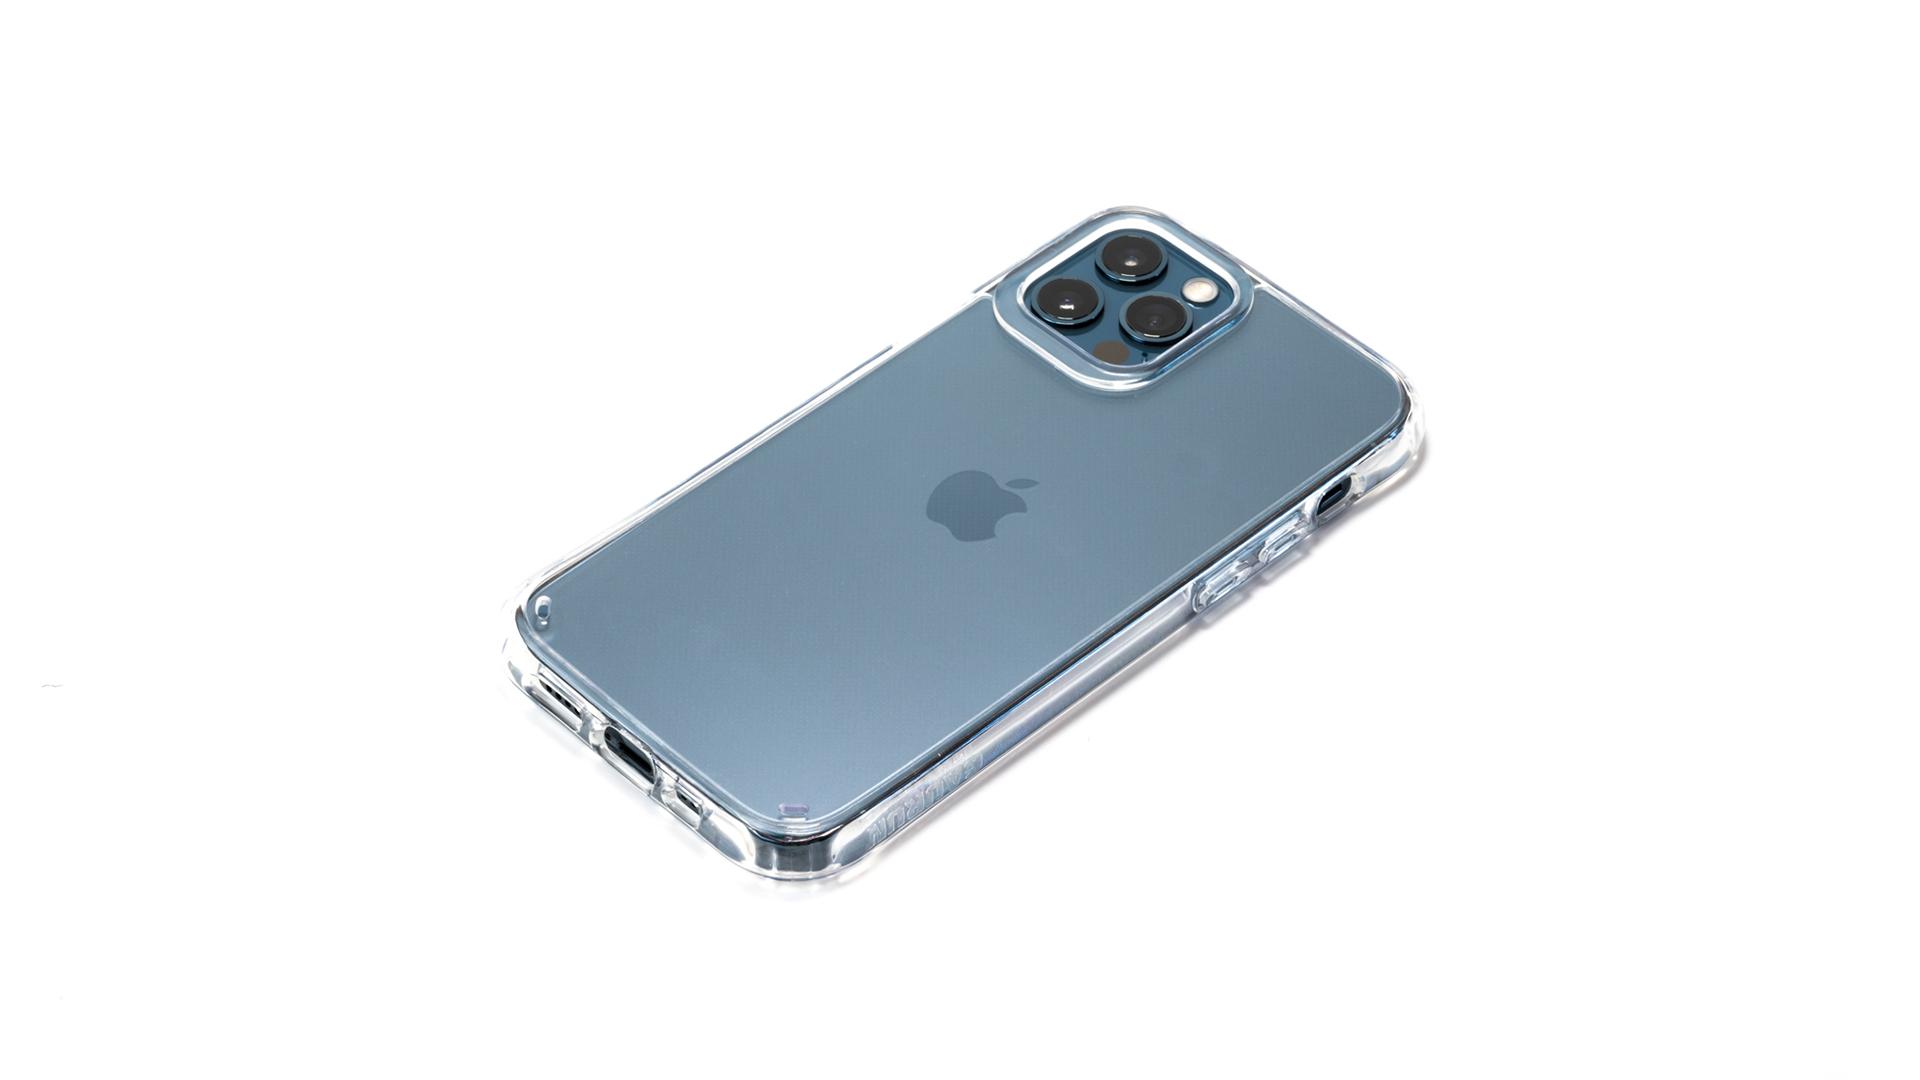 「GAURUN ピュア・ハイブリッド」レビュー。透明度と耐衝撃性を両立したiPhone 12 / 12 Pro用クリアケース